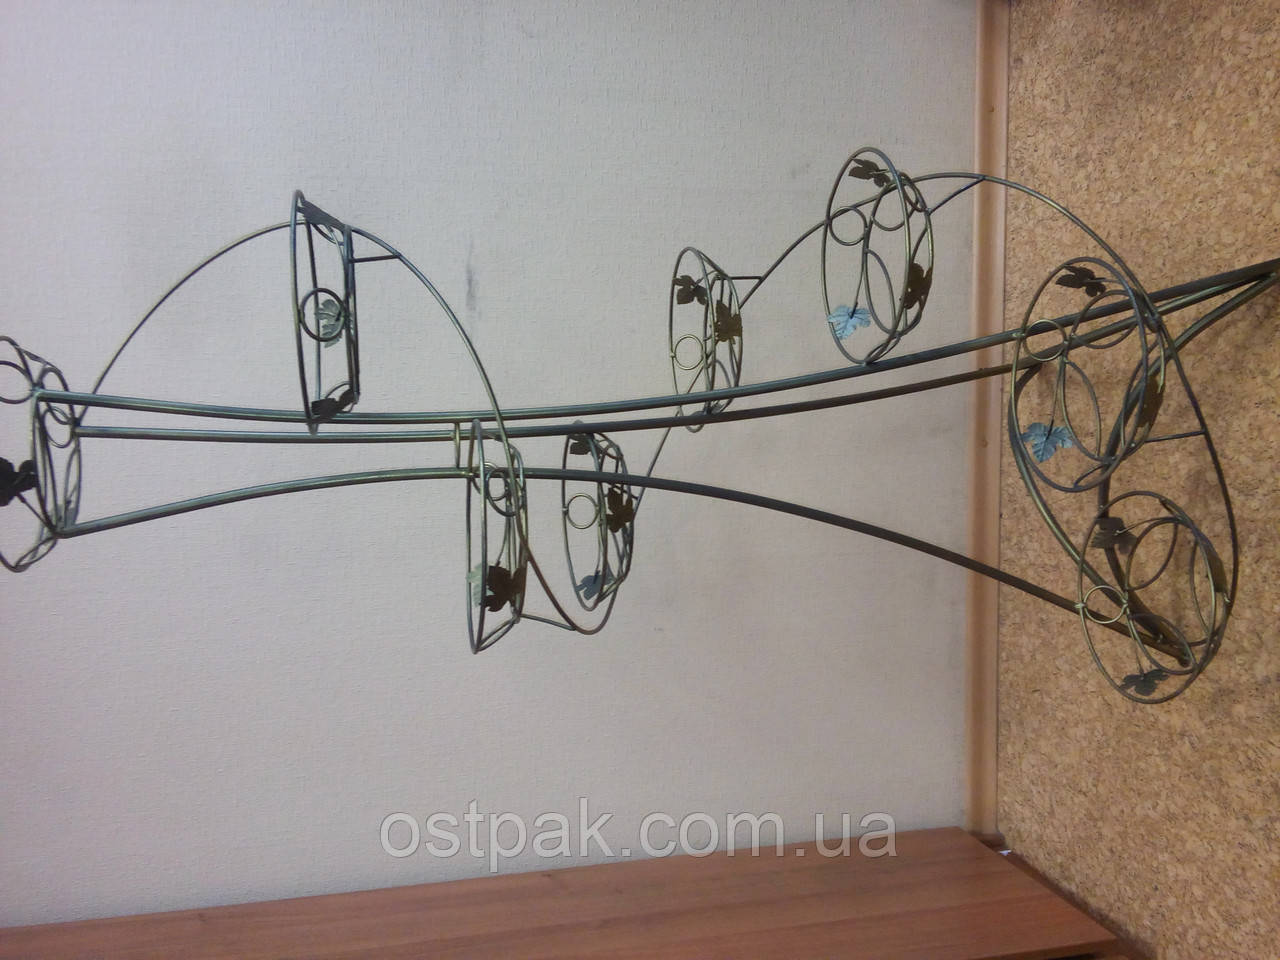 Кованая подставка для цветов, декоративная башня 8 вазонов - МЕШКОТАРА в Черкассах